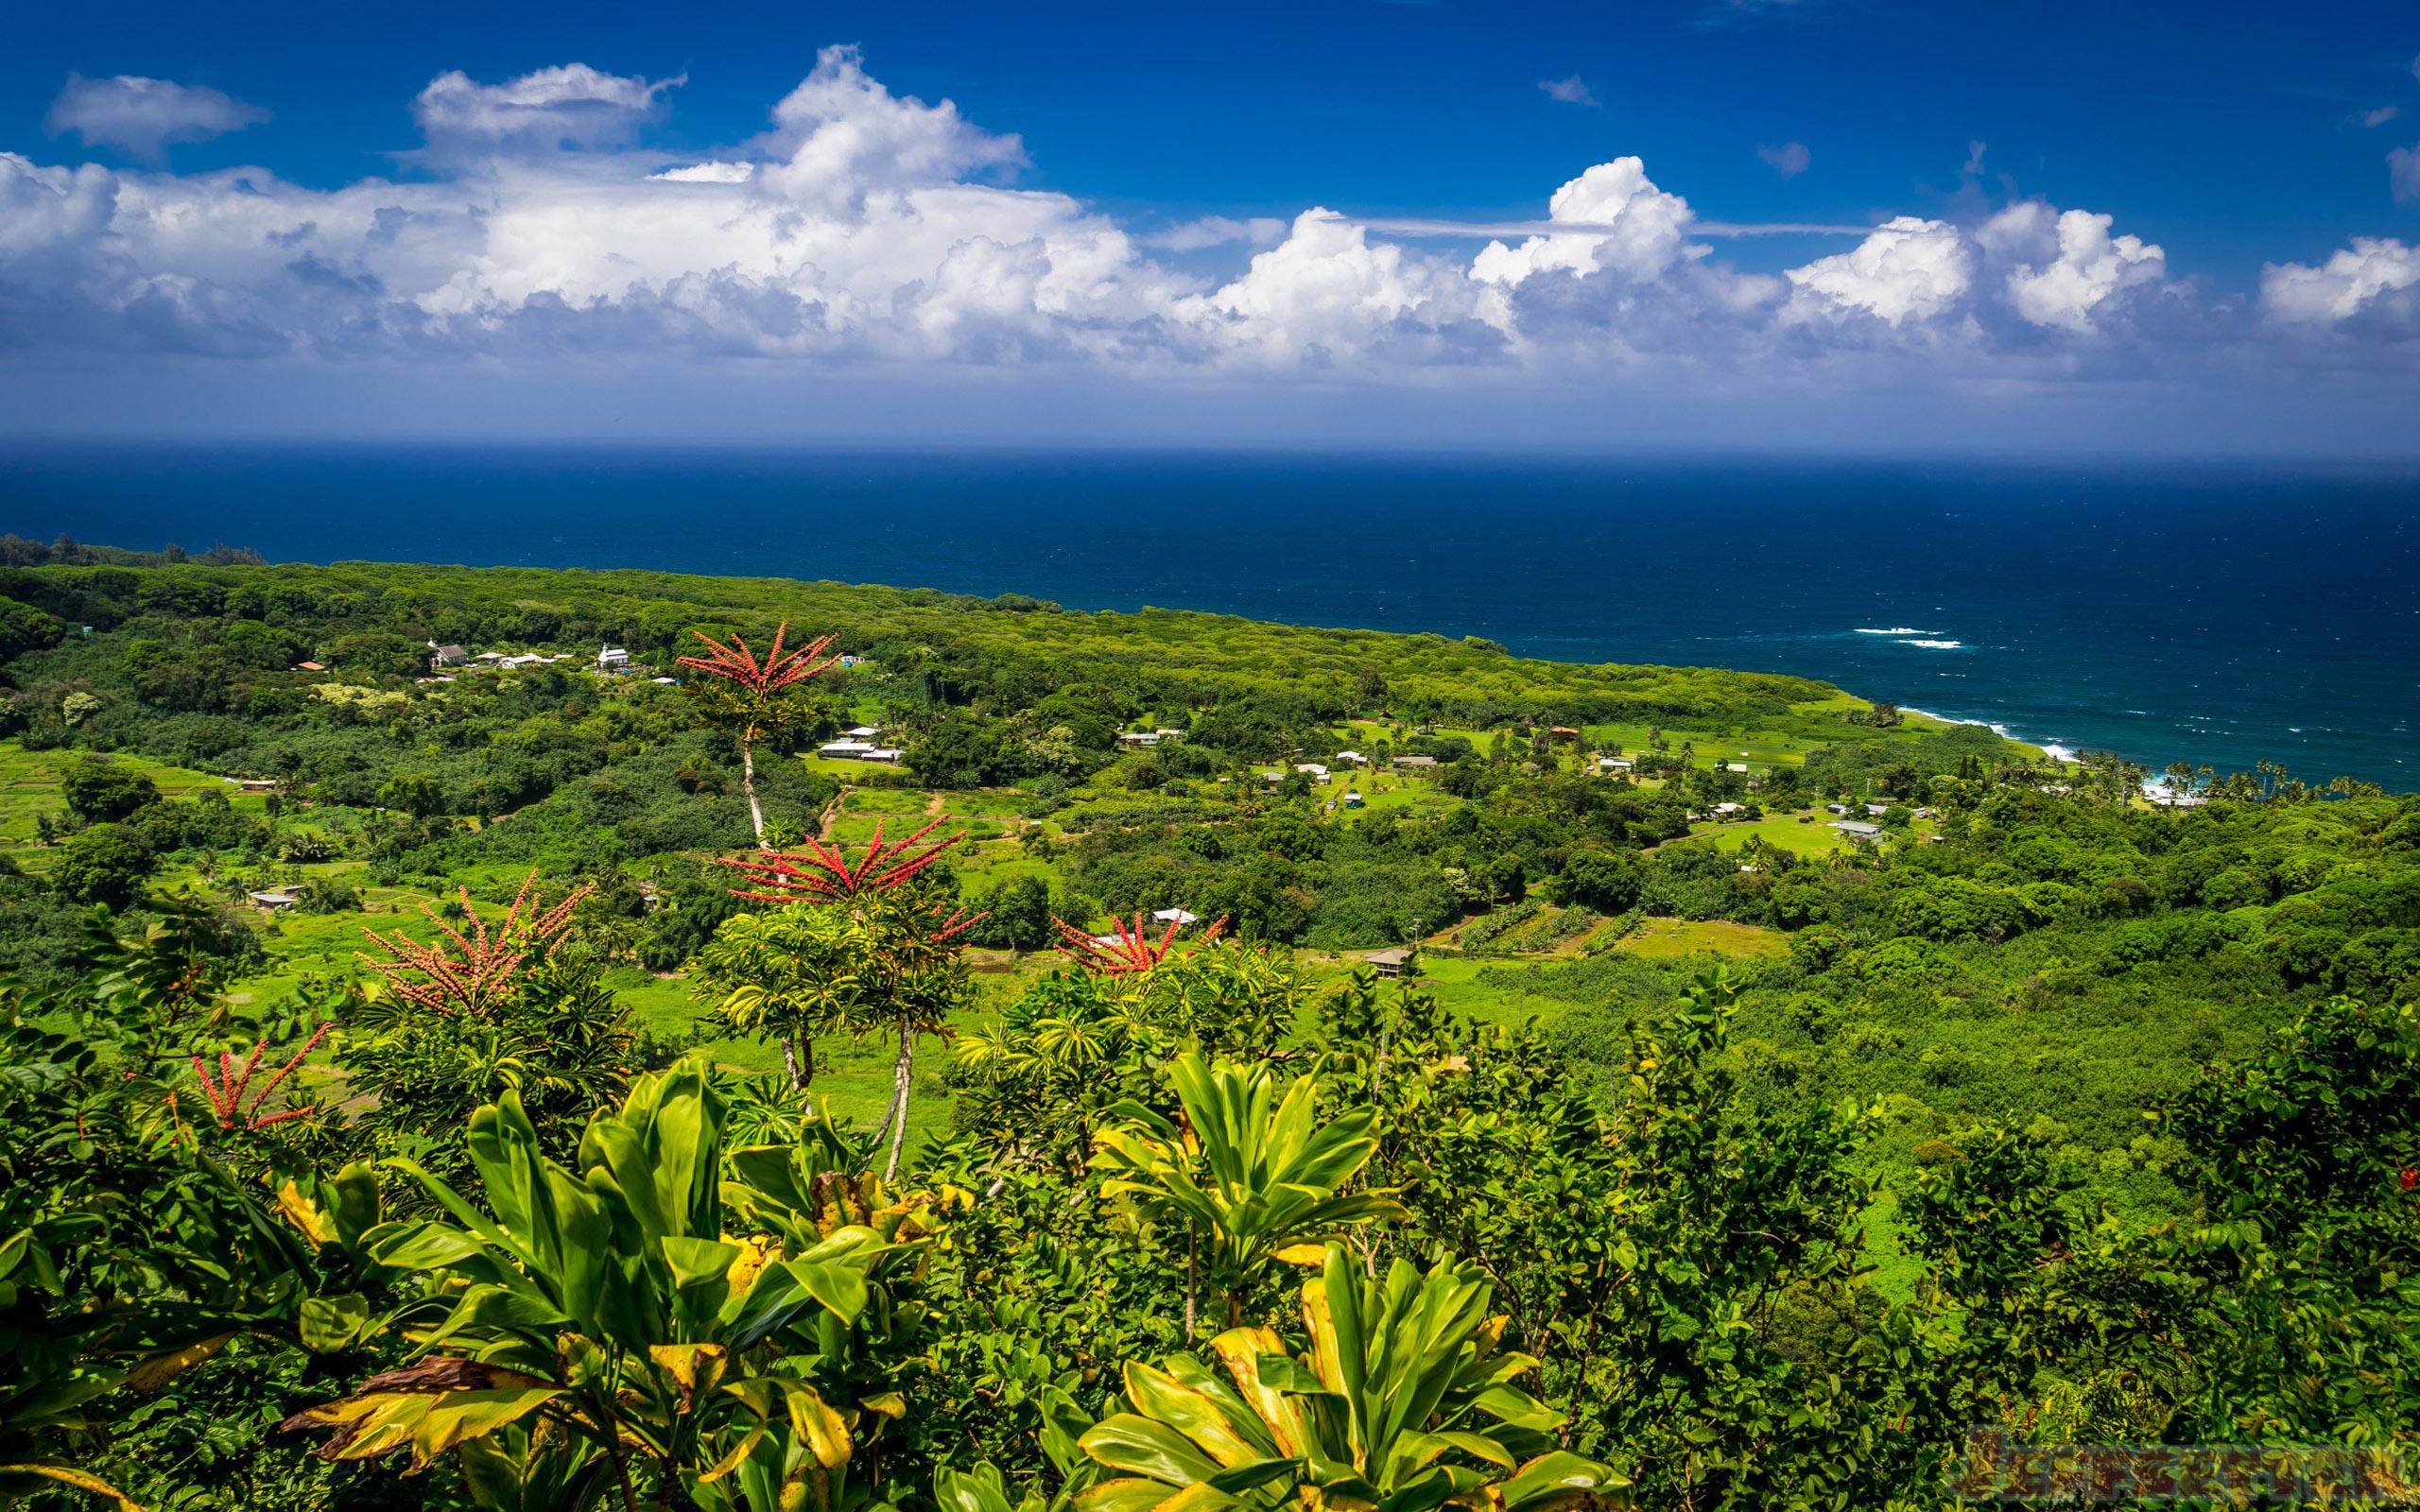 Hana Maui Hawaii Beautiful Desktop Wallpaper HD Widescreen 2560x1600